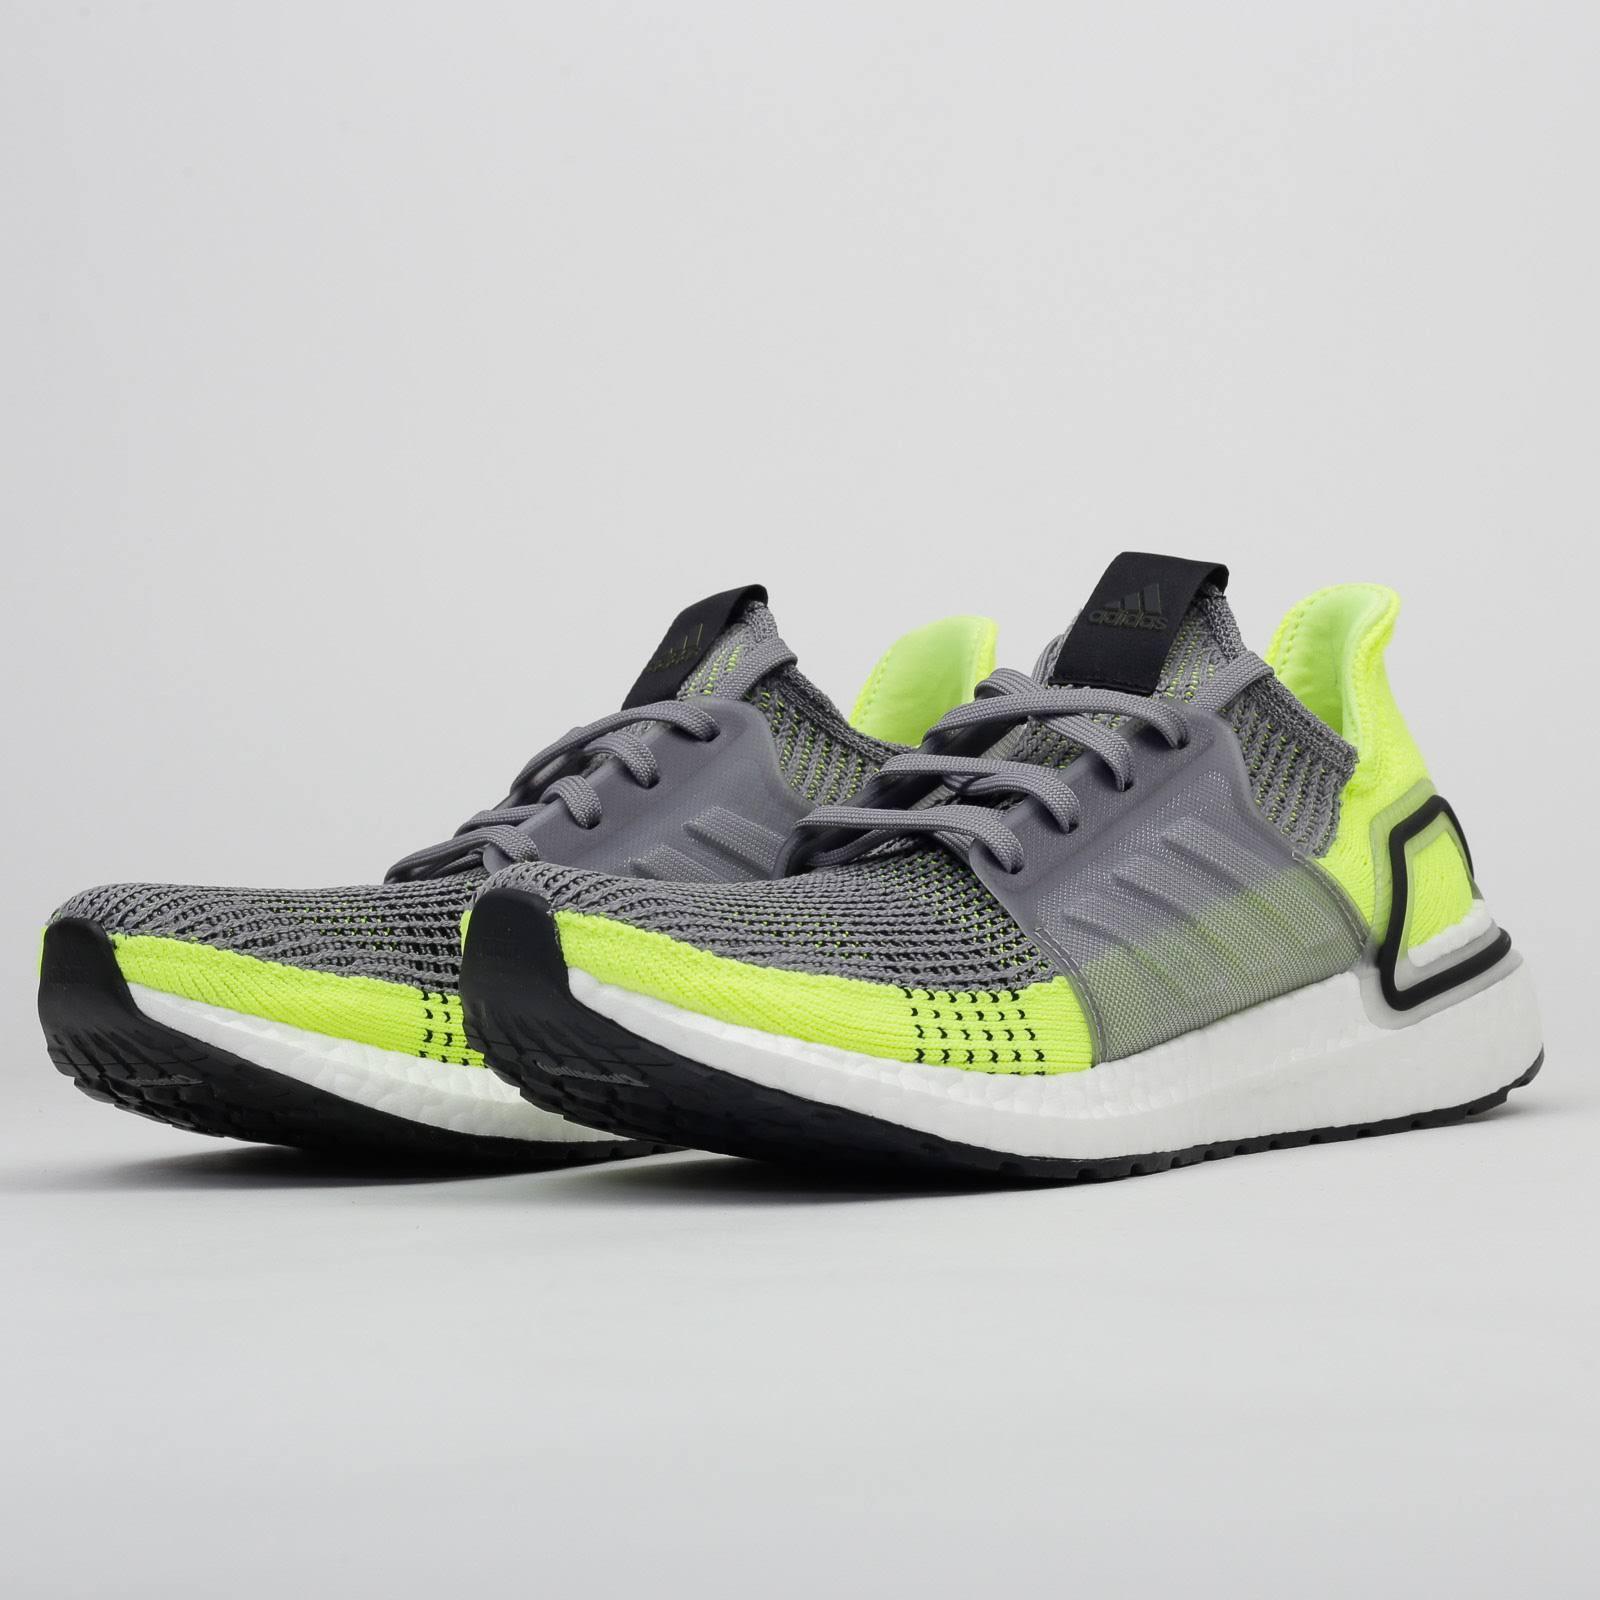 Sneakers adidas Performance UltraBoost 19 M grey / neonyellow / ftwwht